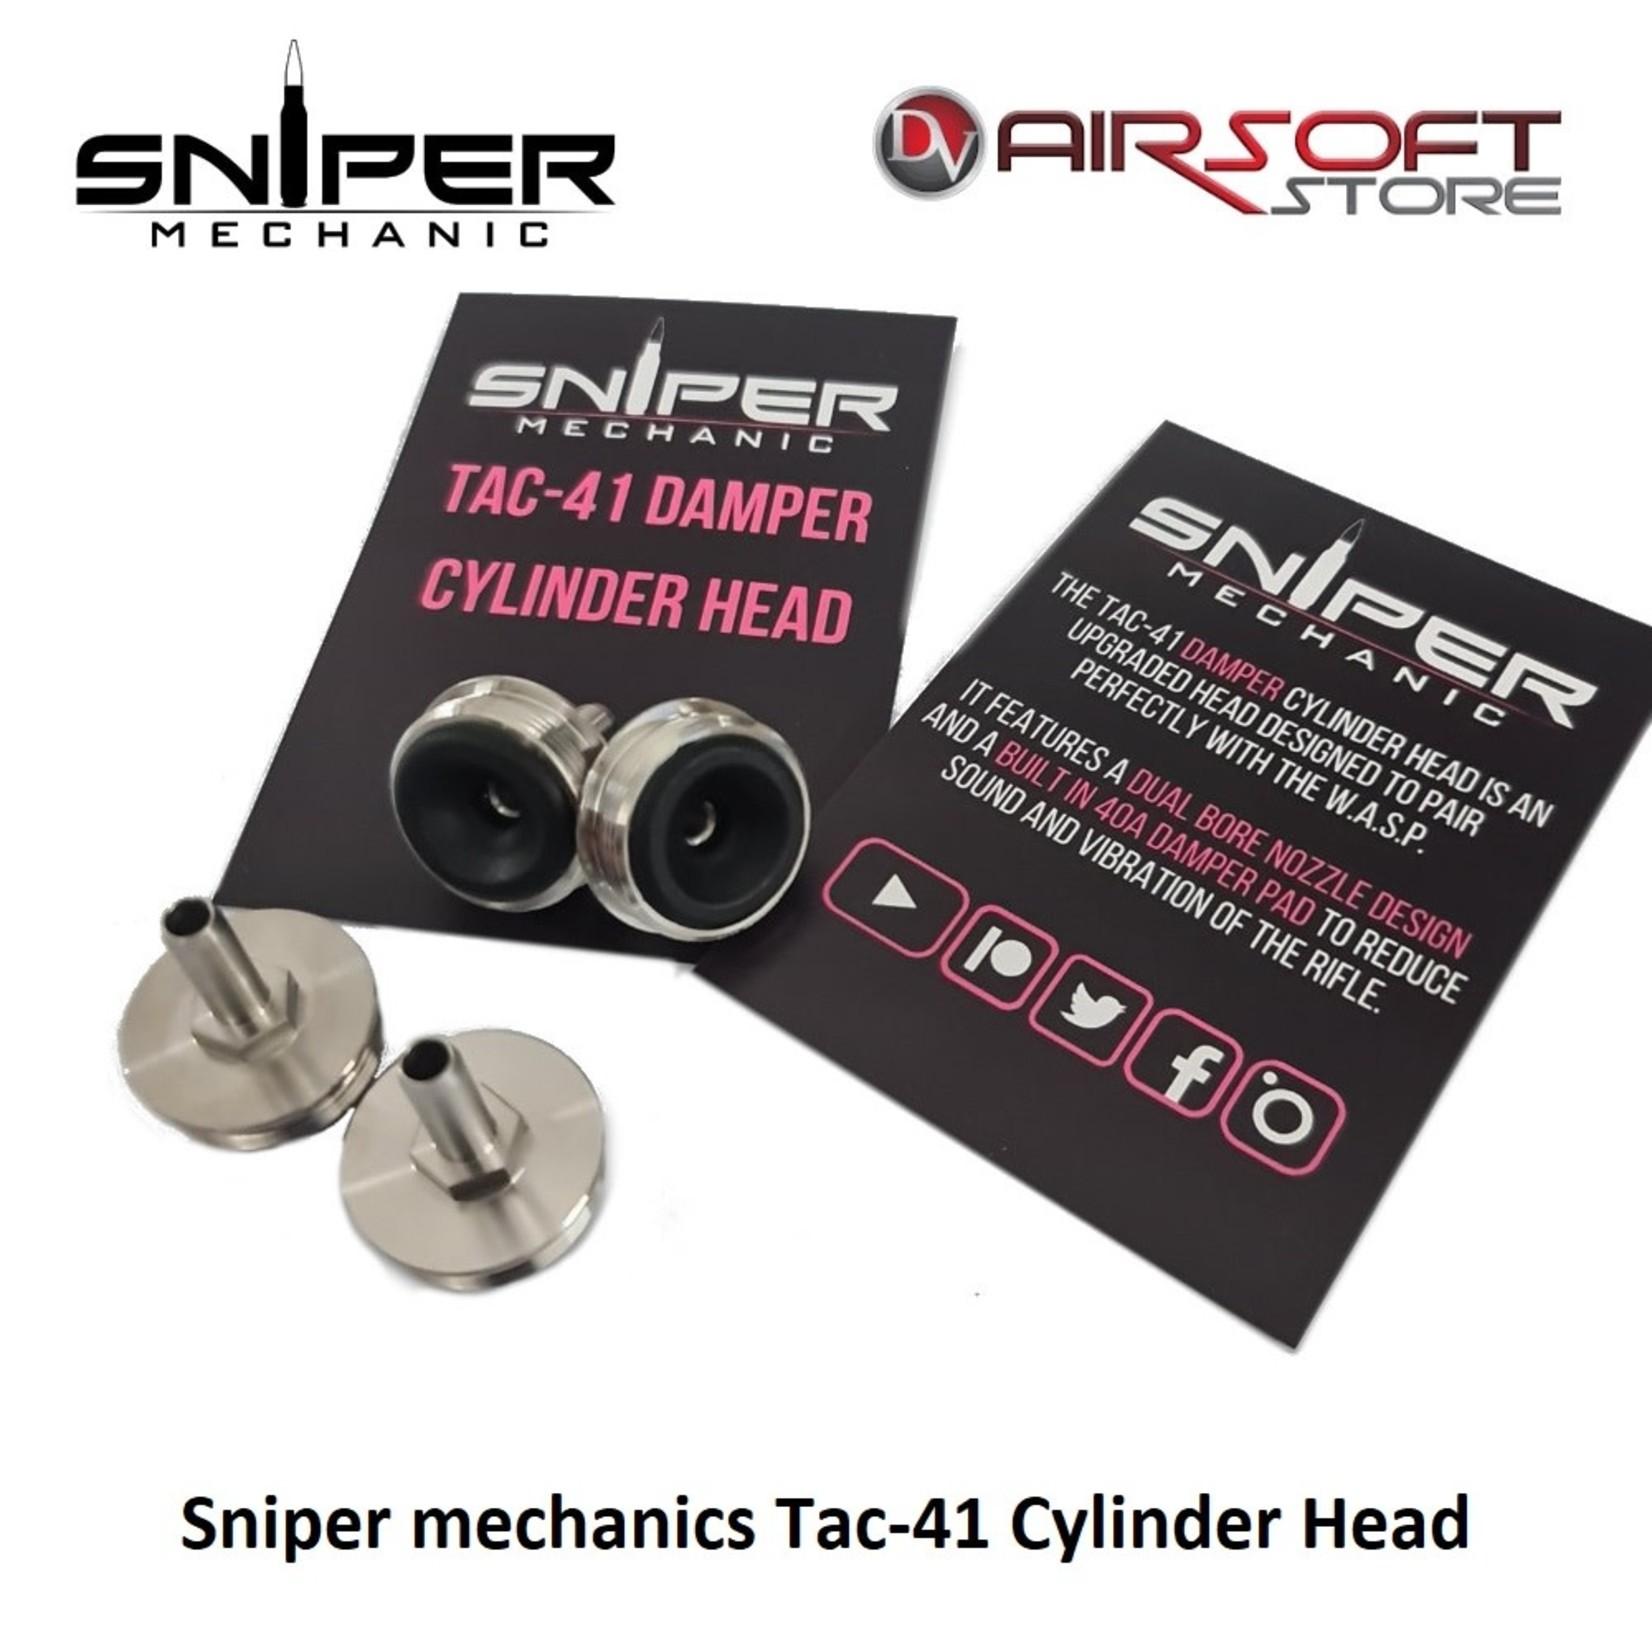 SniperMechanics Tac-41 Cylinder Head